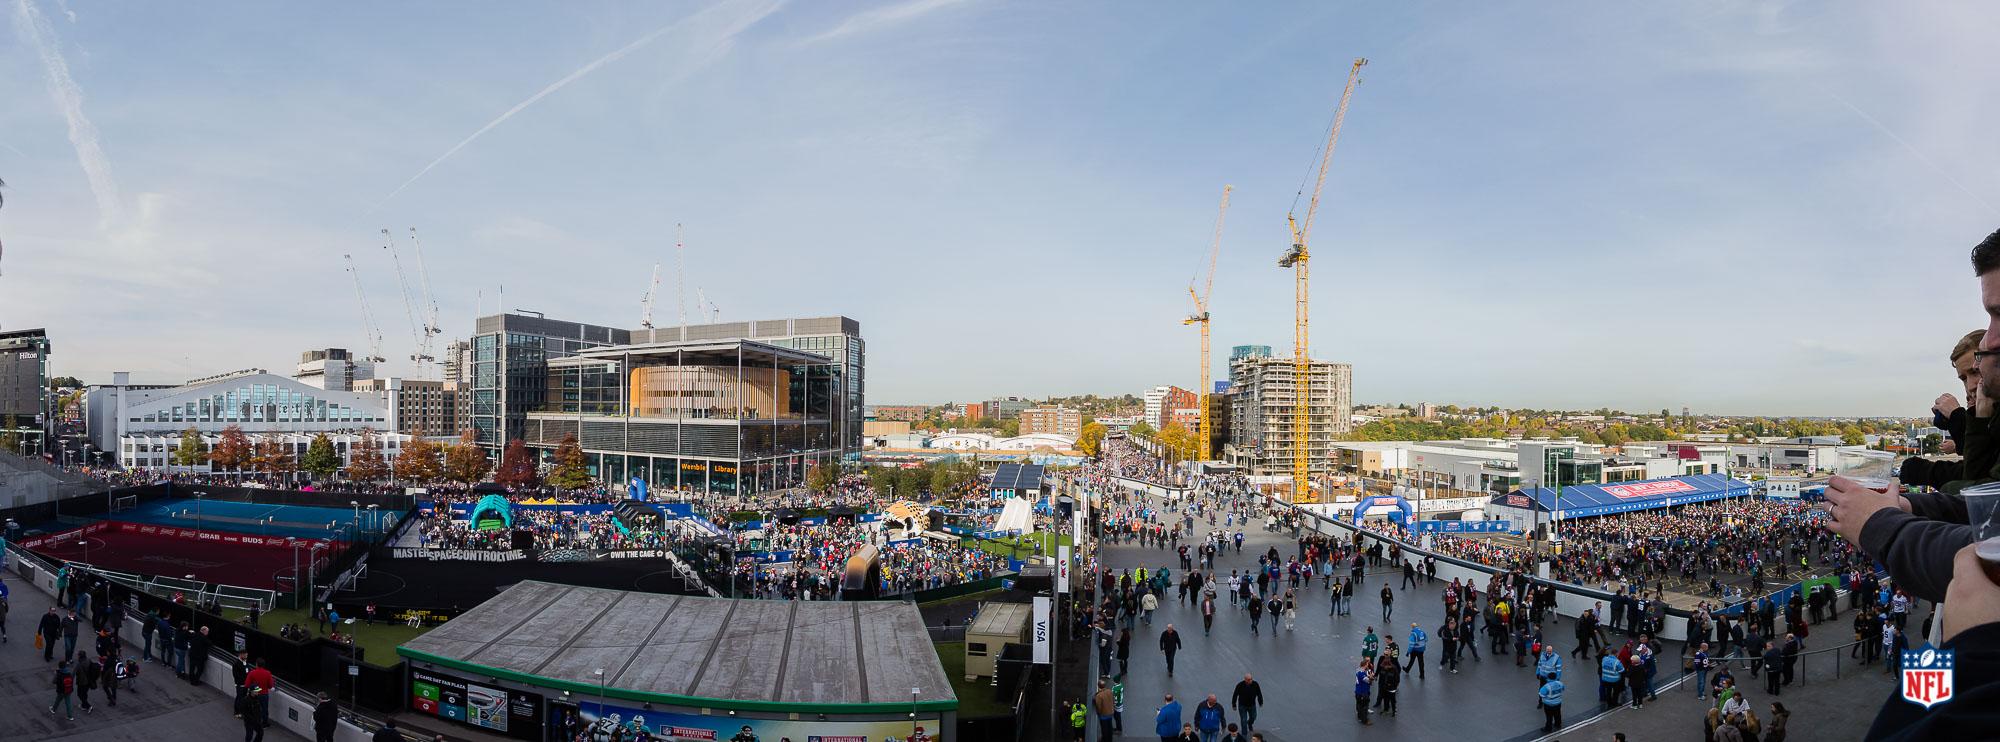 007_151025_London_Wembley_Game13_Decor_141009.jpg